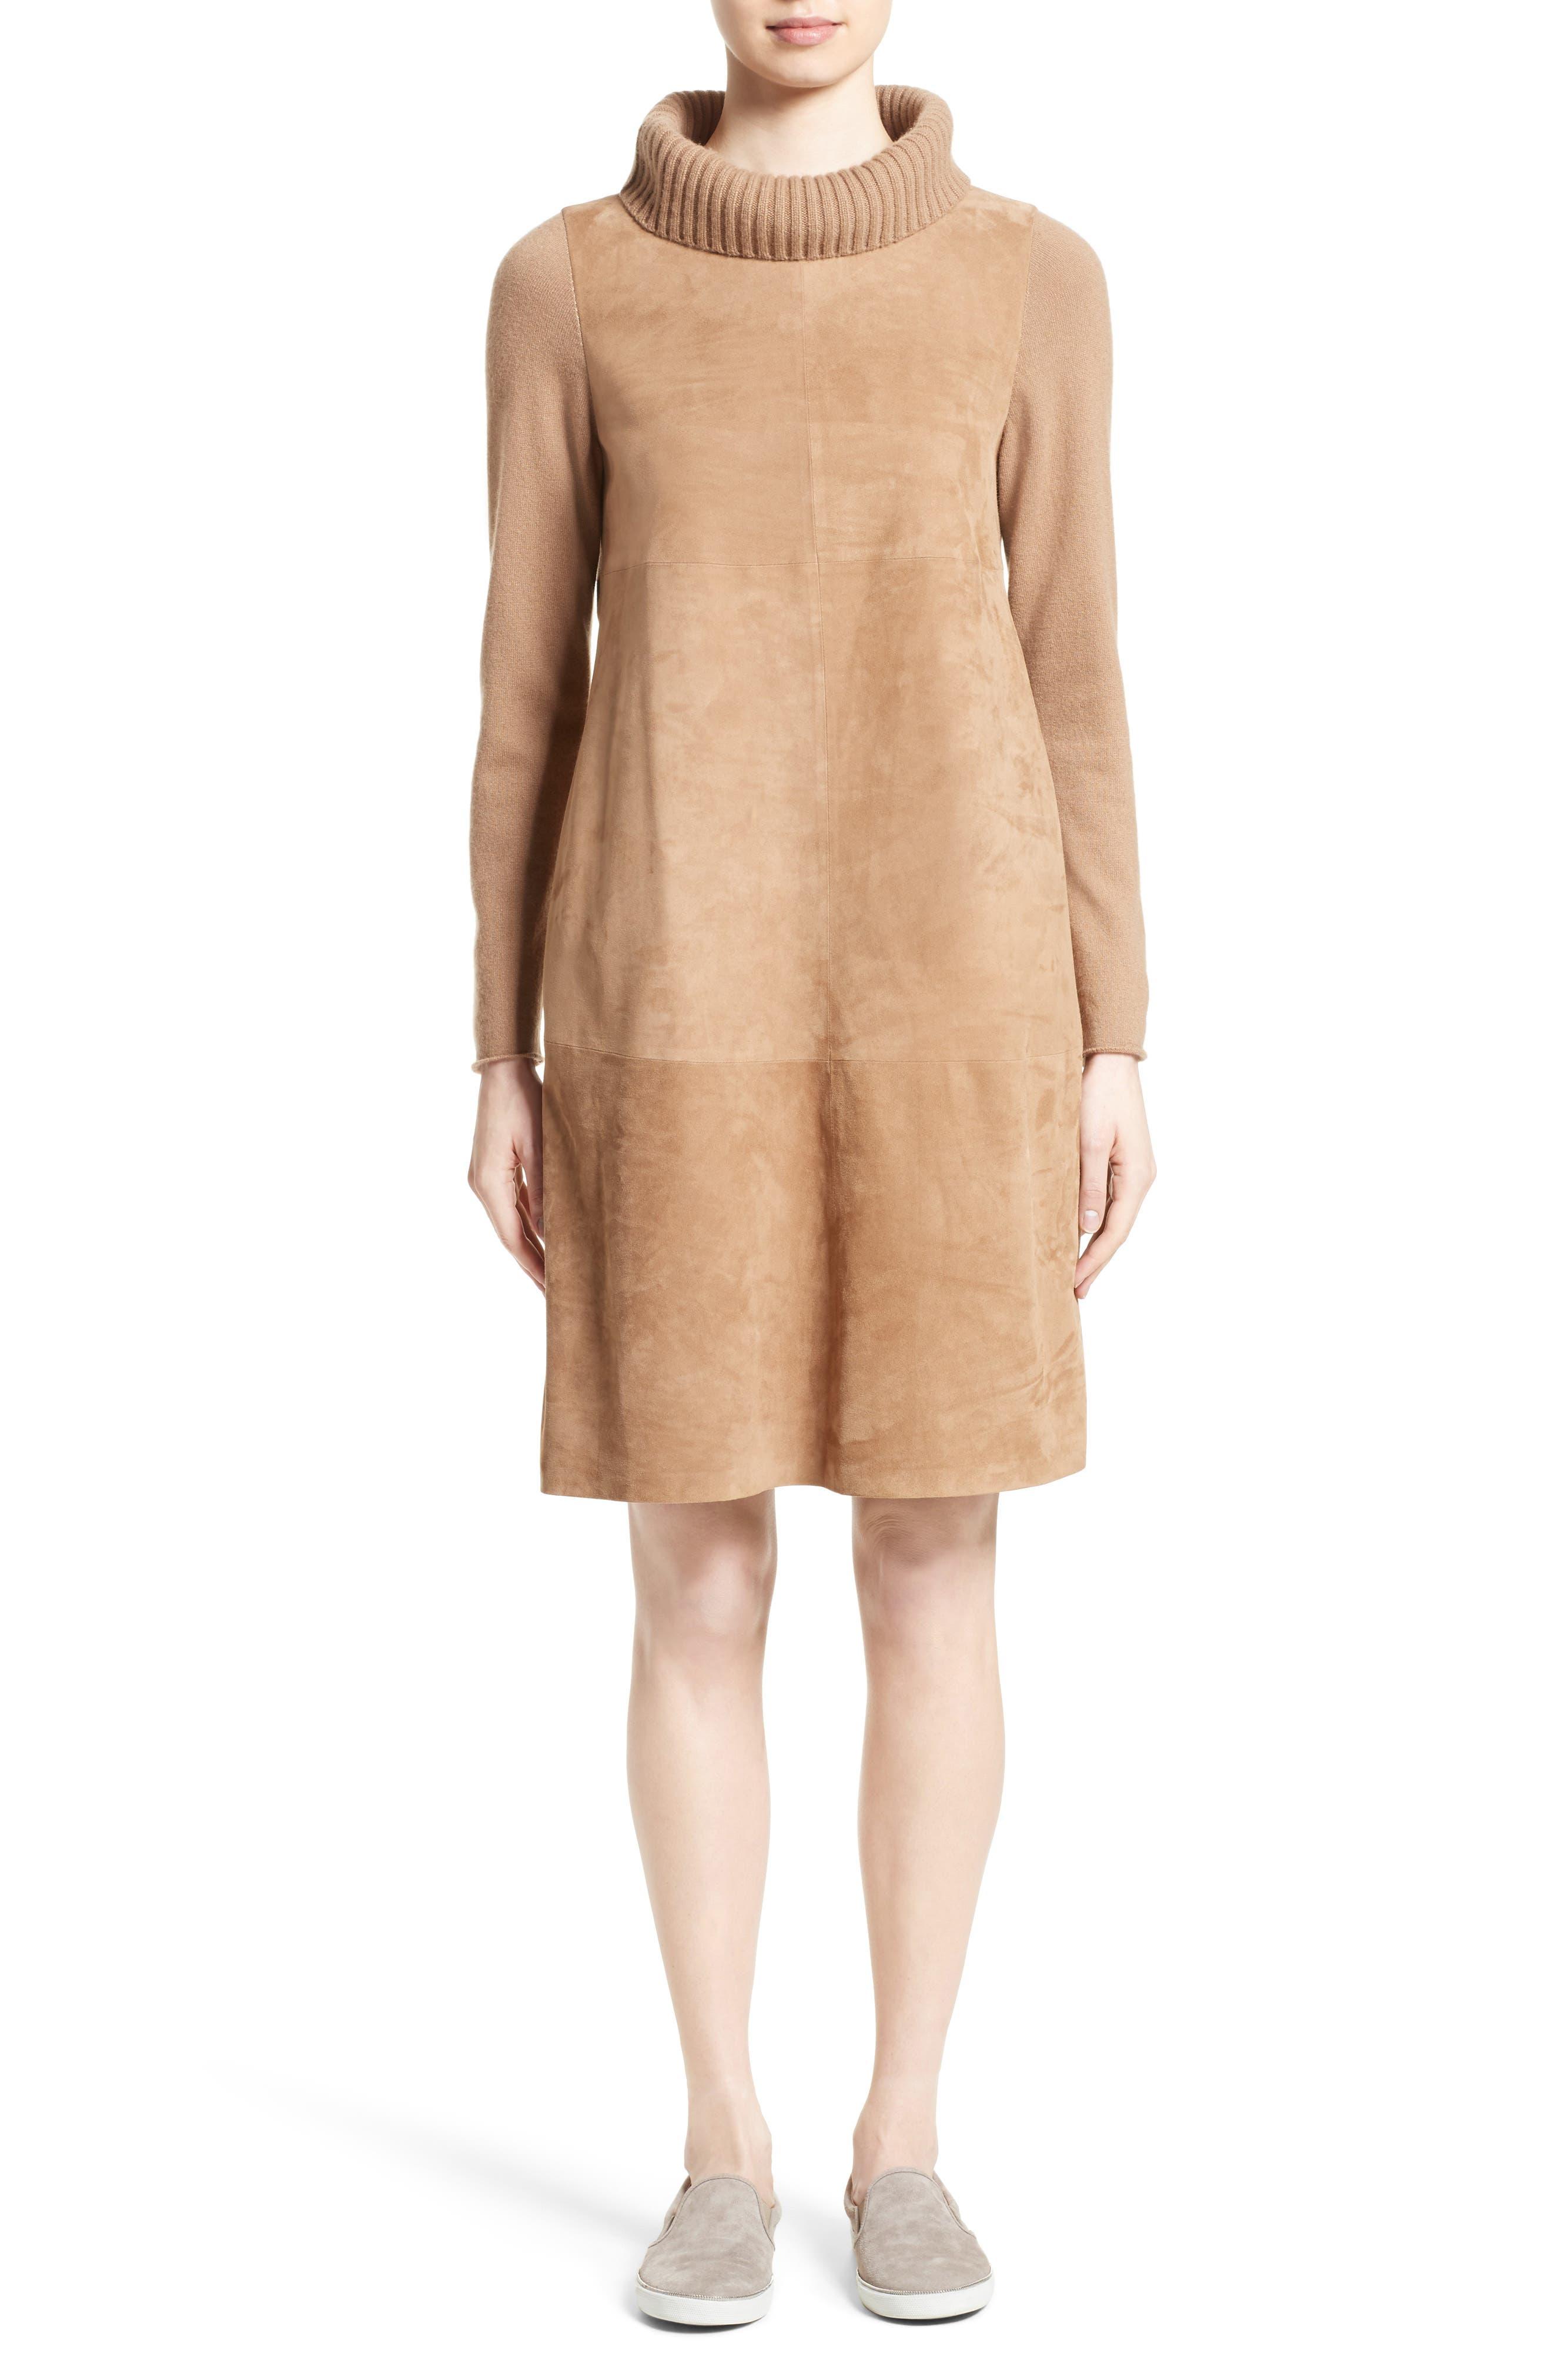 Fabiana Filippi Suede & Cashmere Dress